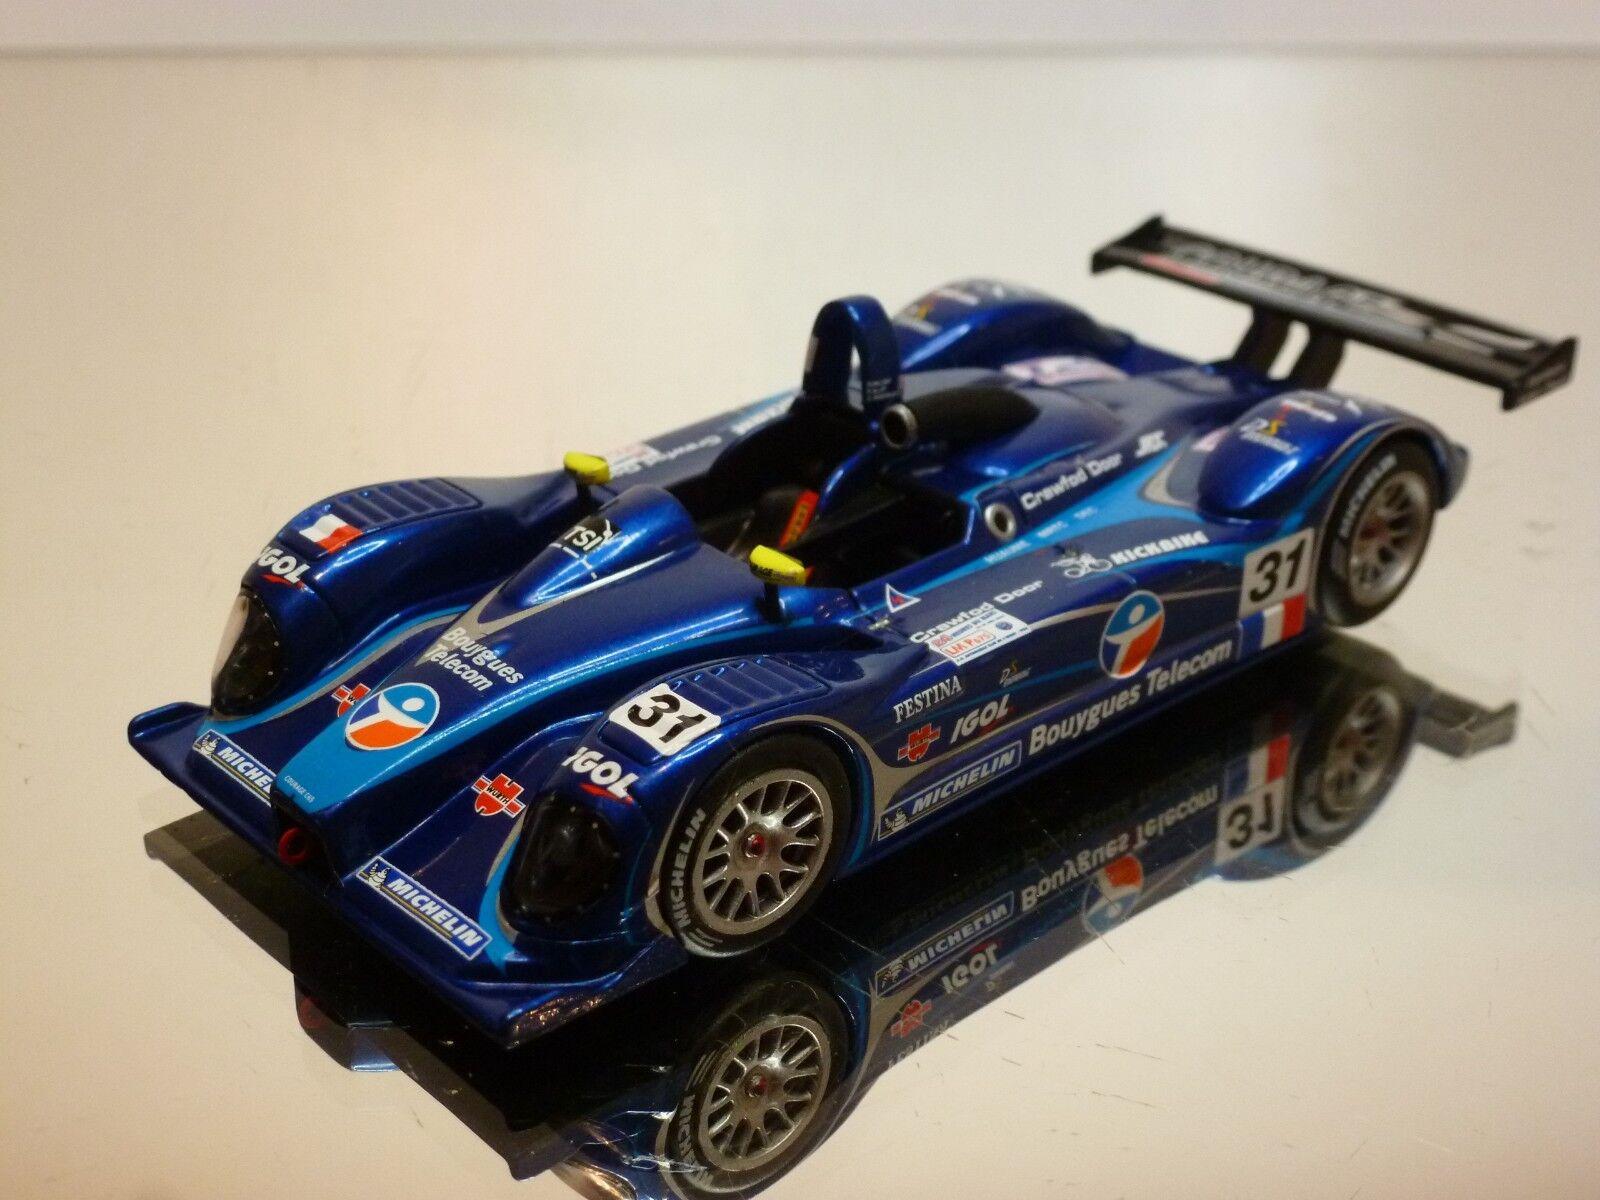 SPARK COURAGE C65 JPX 2003 blueE  METALLIC 1 43 - EXCELLENT - 20+21